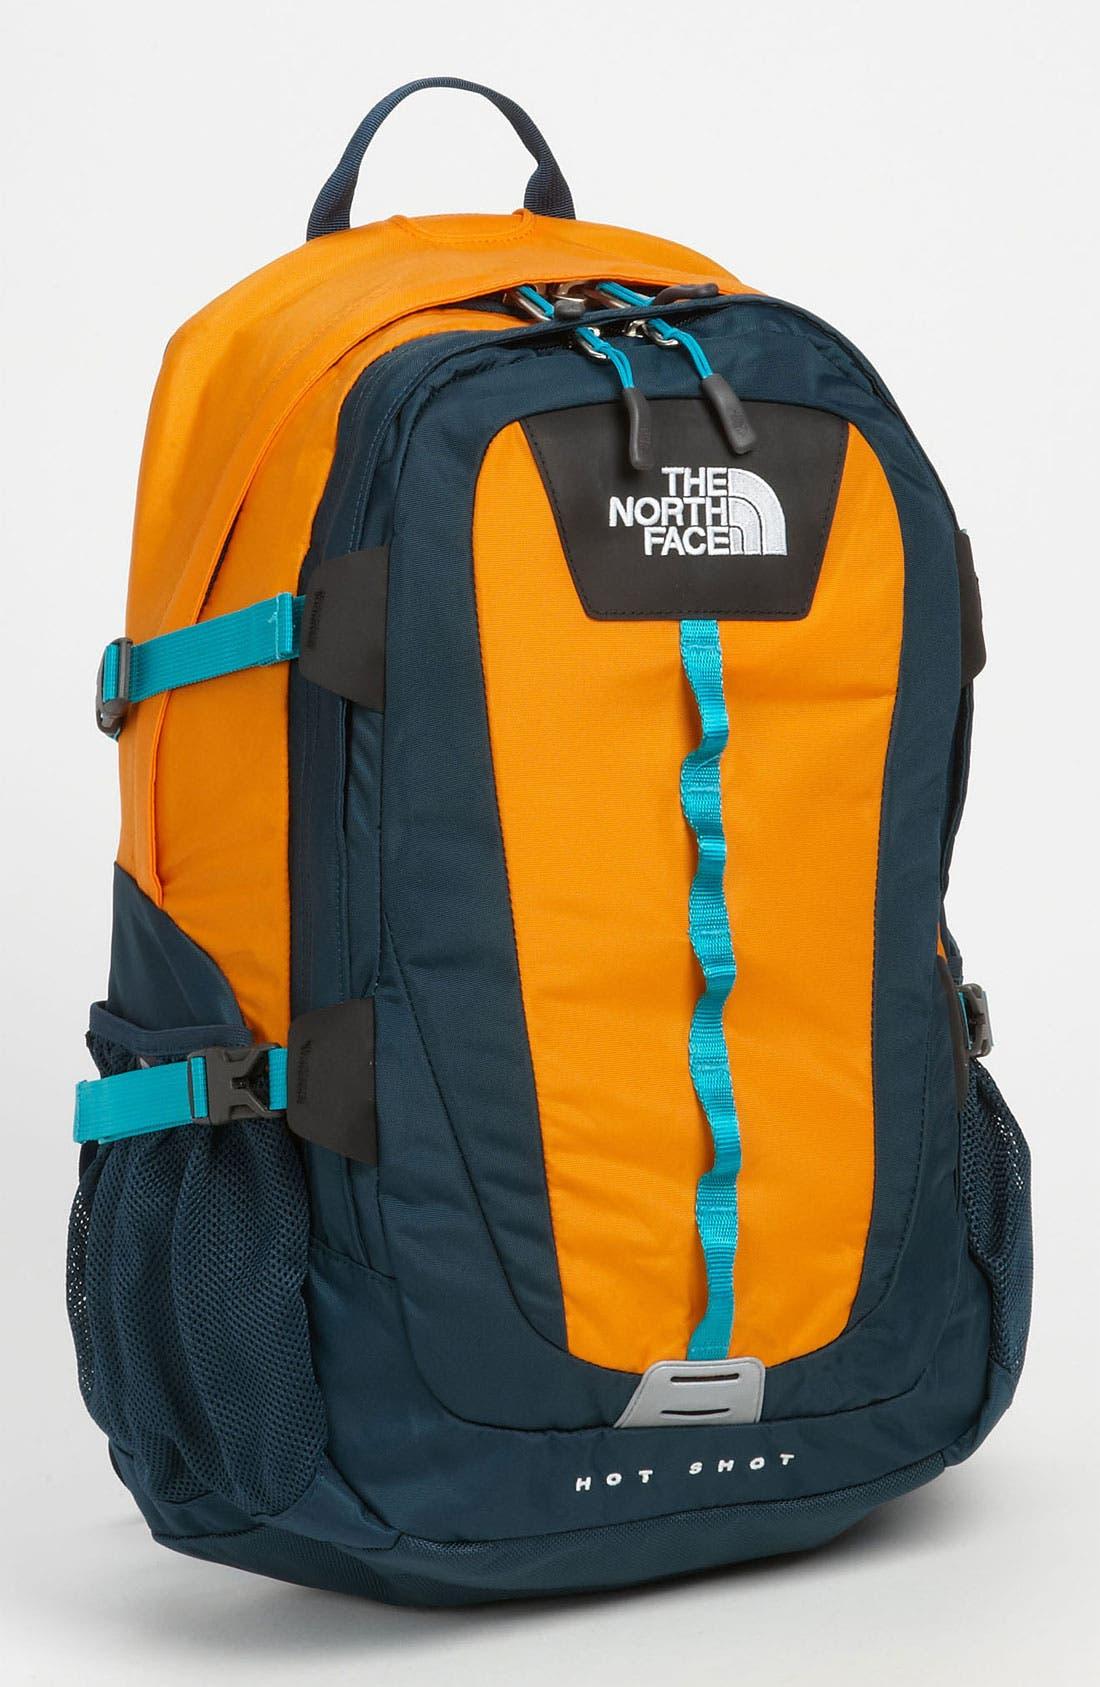 Main Image - The North Face 'Hot Shot' Backpack